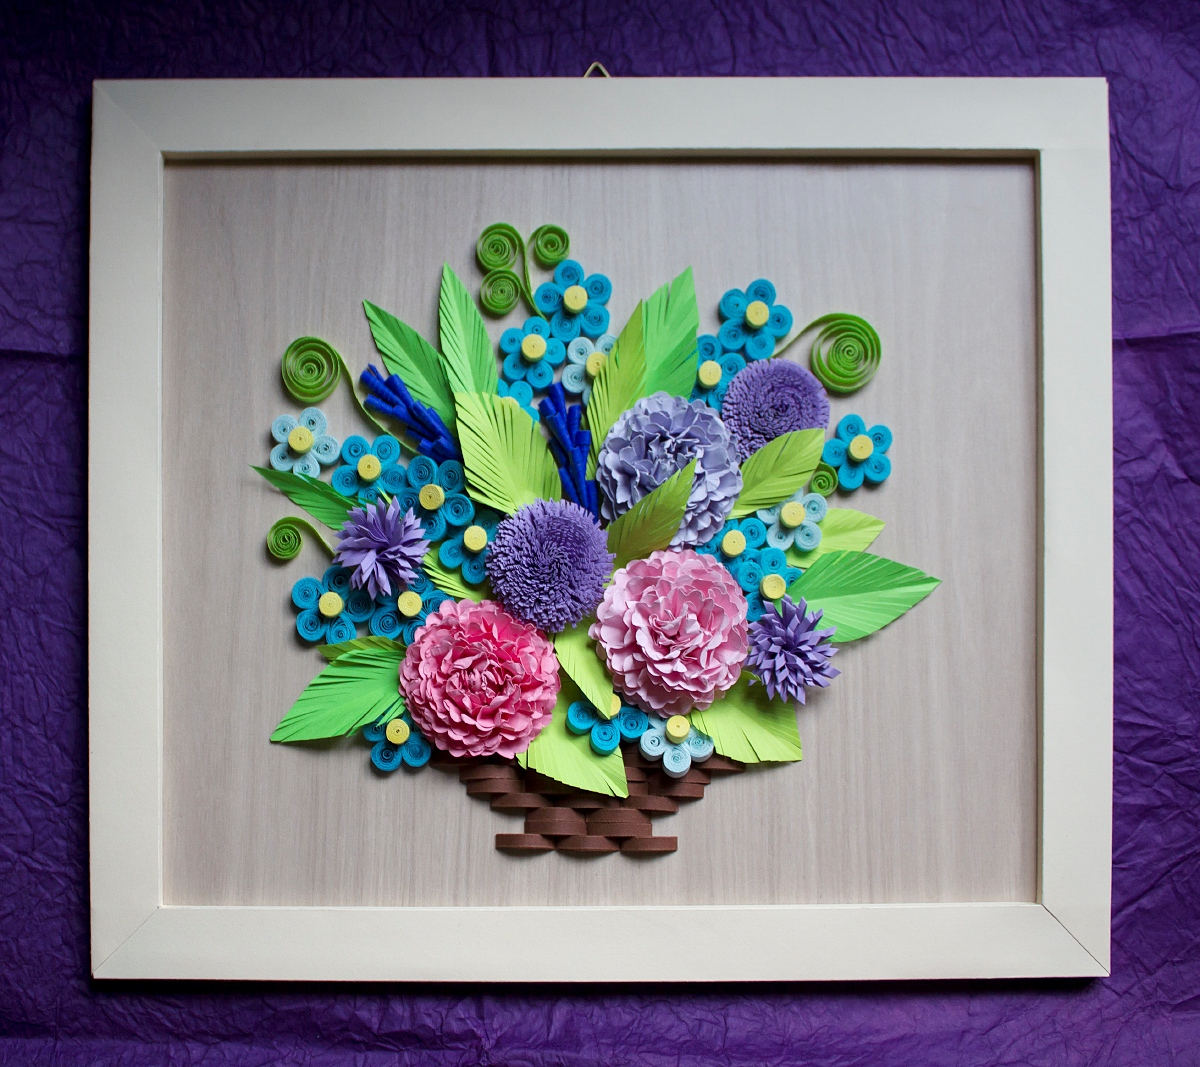 Paprvilg Virgos Kosr Tabln Quilled Flower Basket Wall Picture